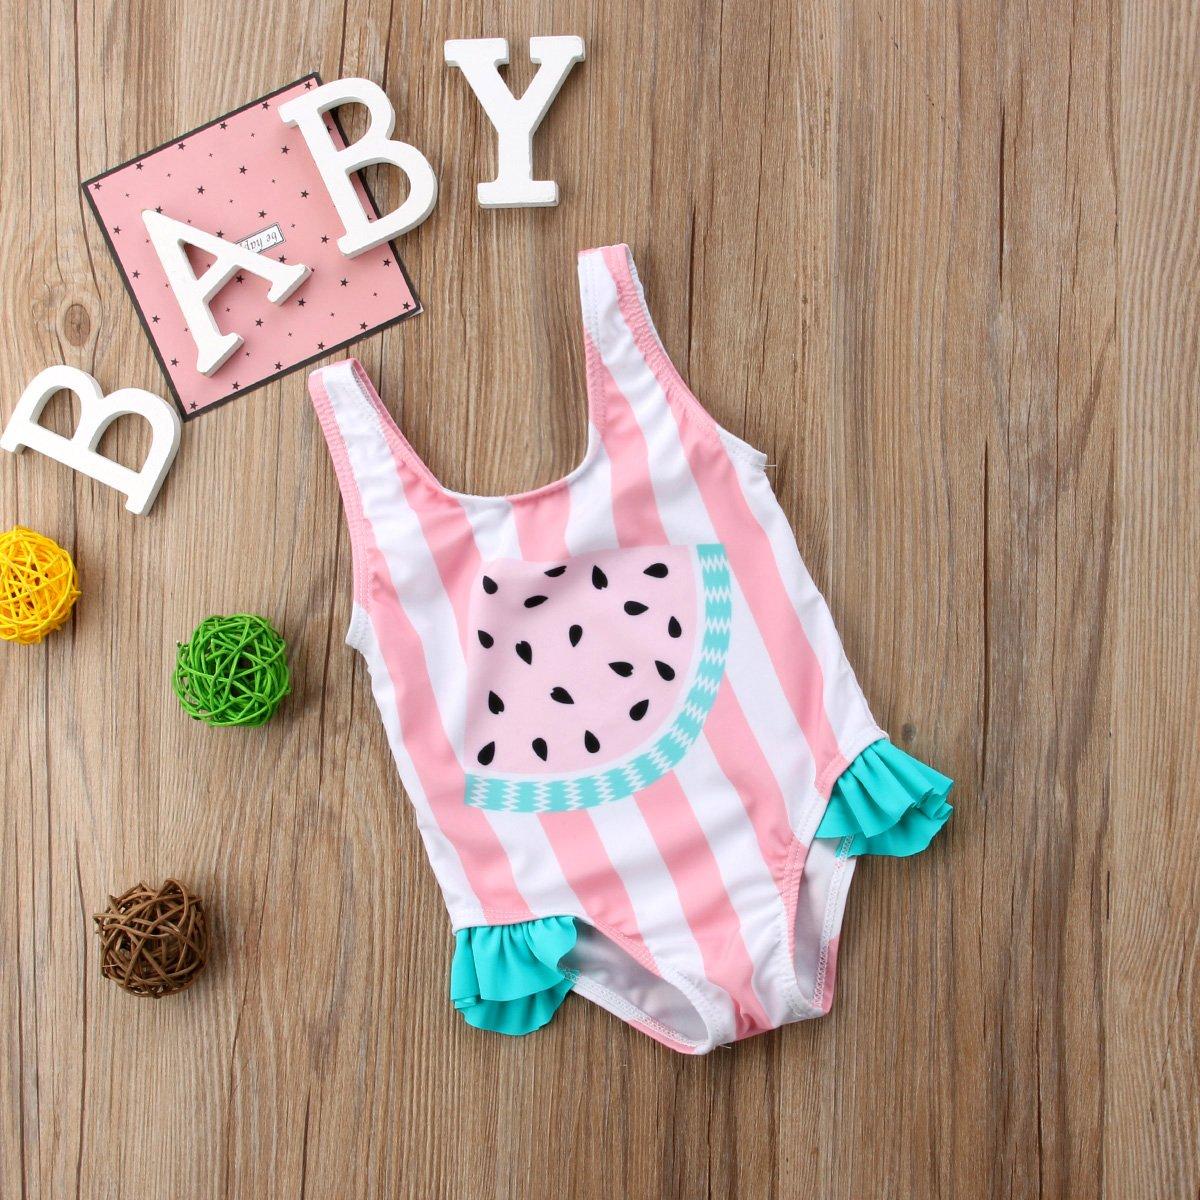 Newborn Toddler Baby Girl Floral Watermelon Swimsuit Striped Bathing Suit Bikini Cute Swimwear One Piece Beach Wear